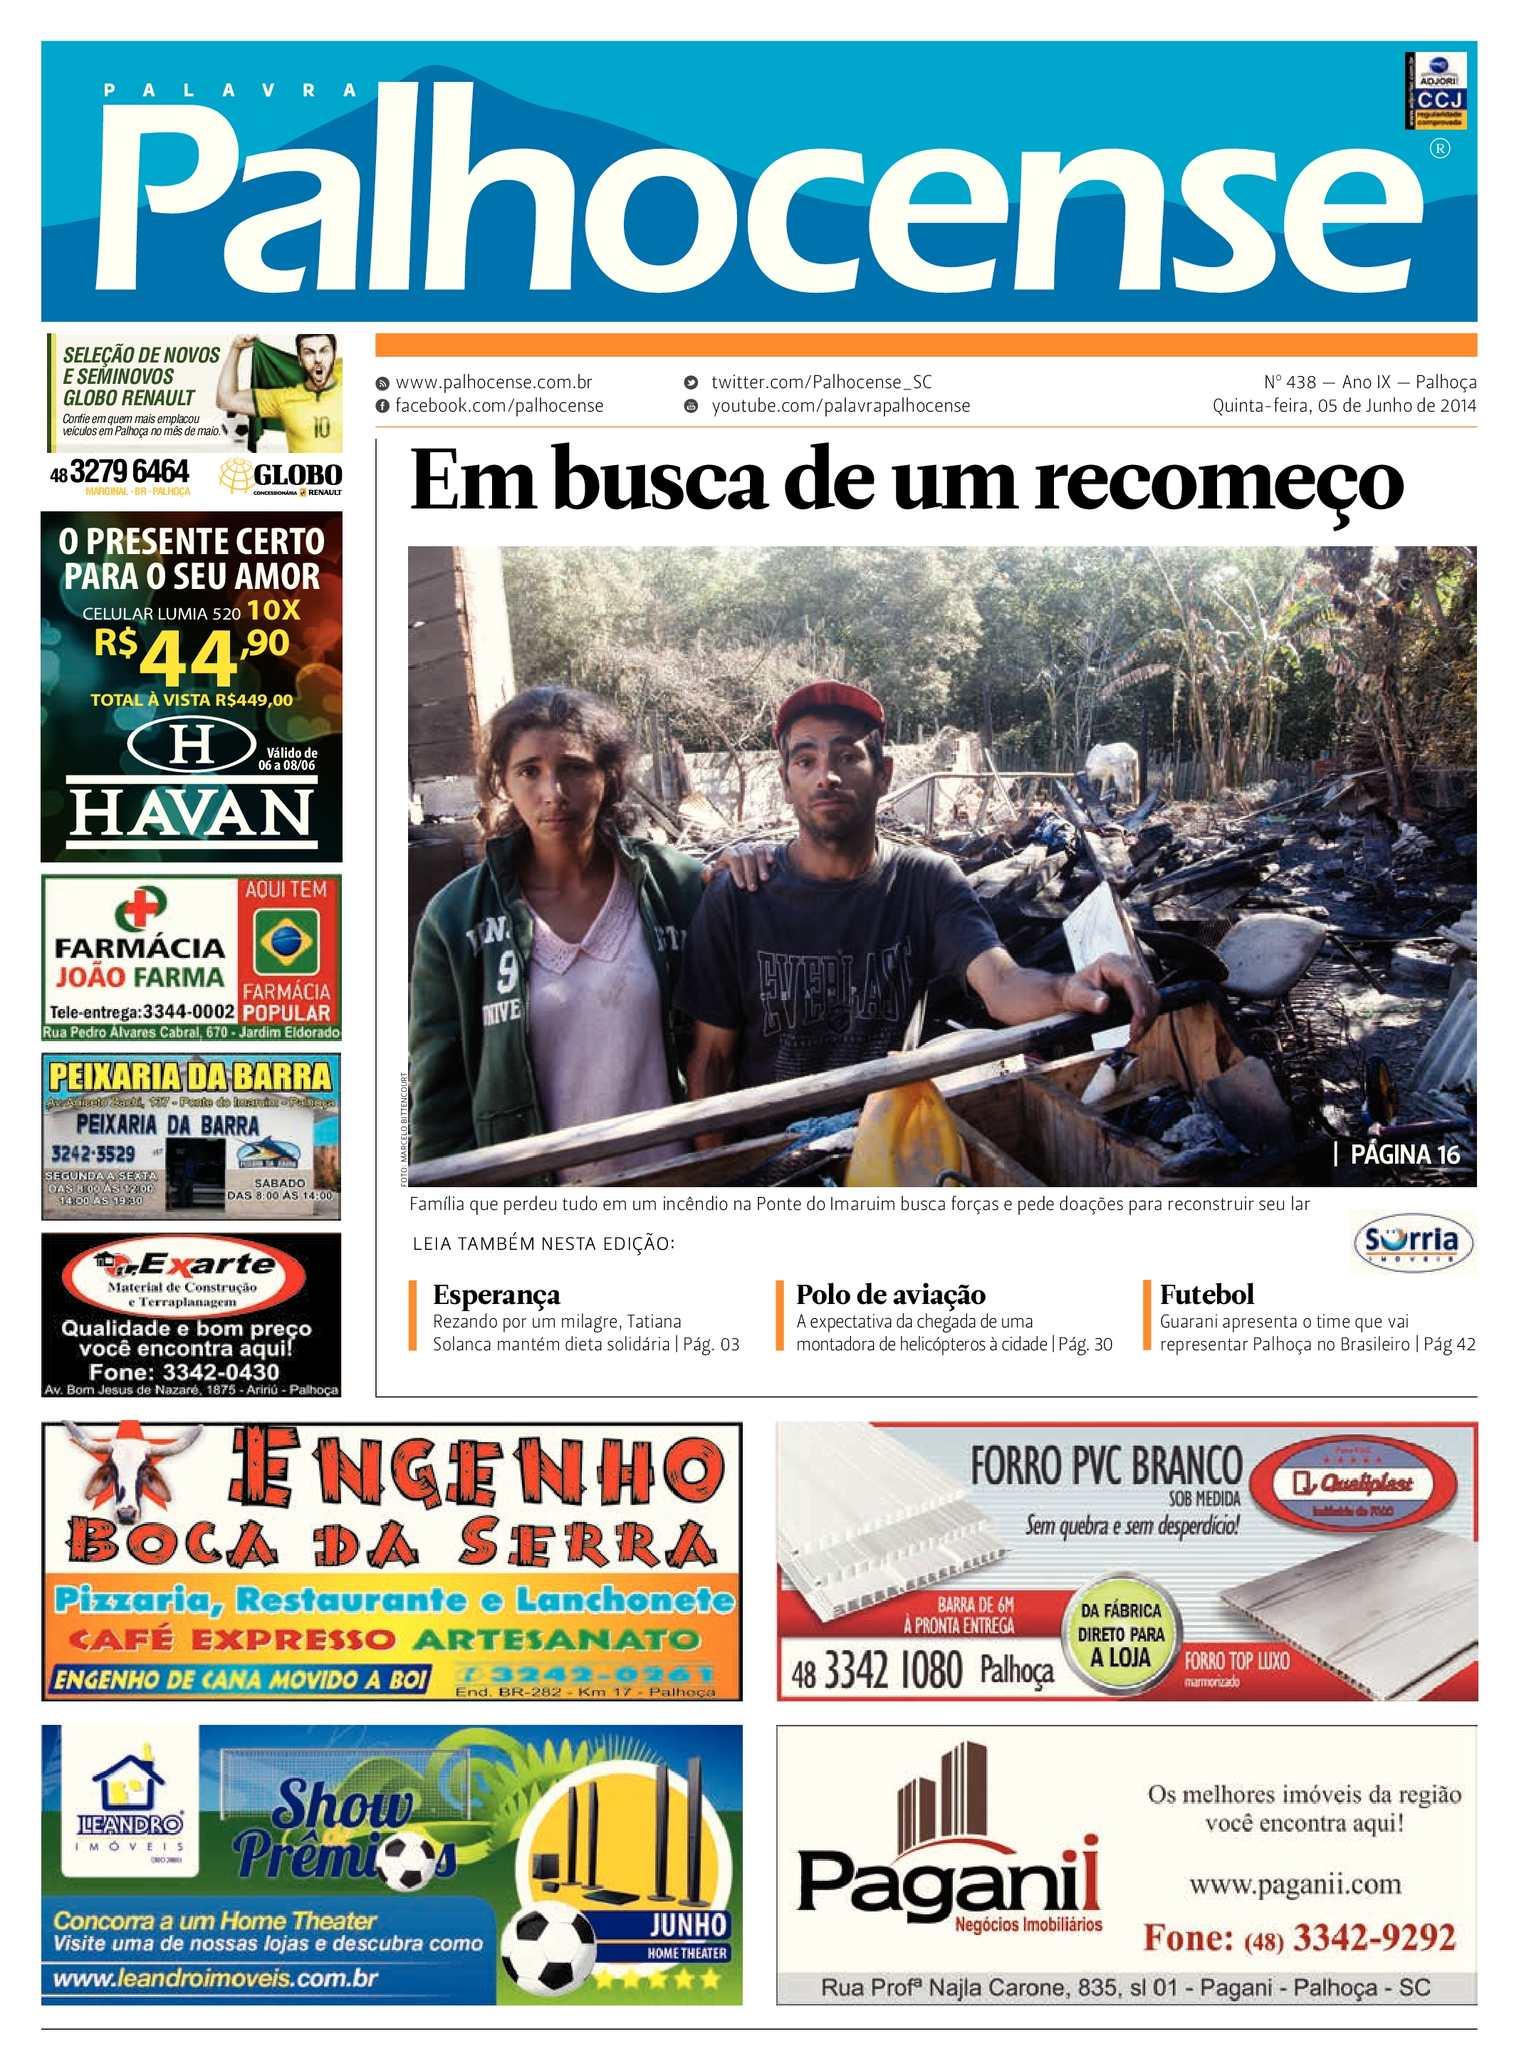 Calaméo - Jornal Palavra Palhocense - Edição 438 206408672a963